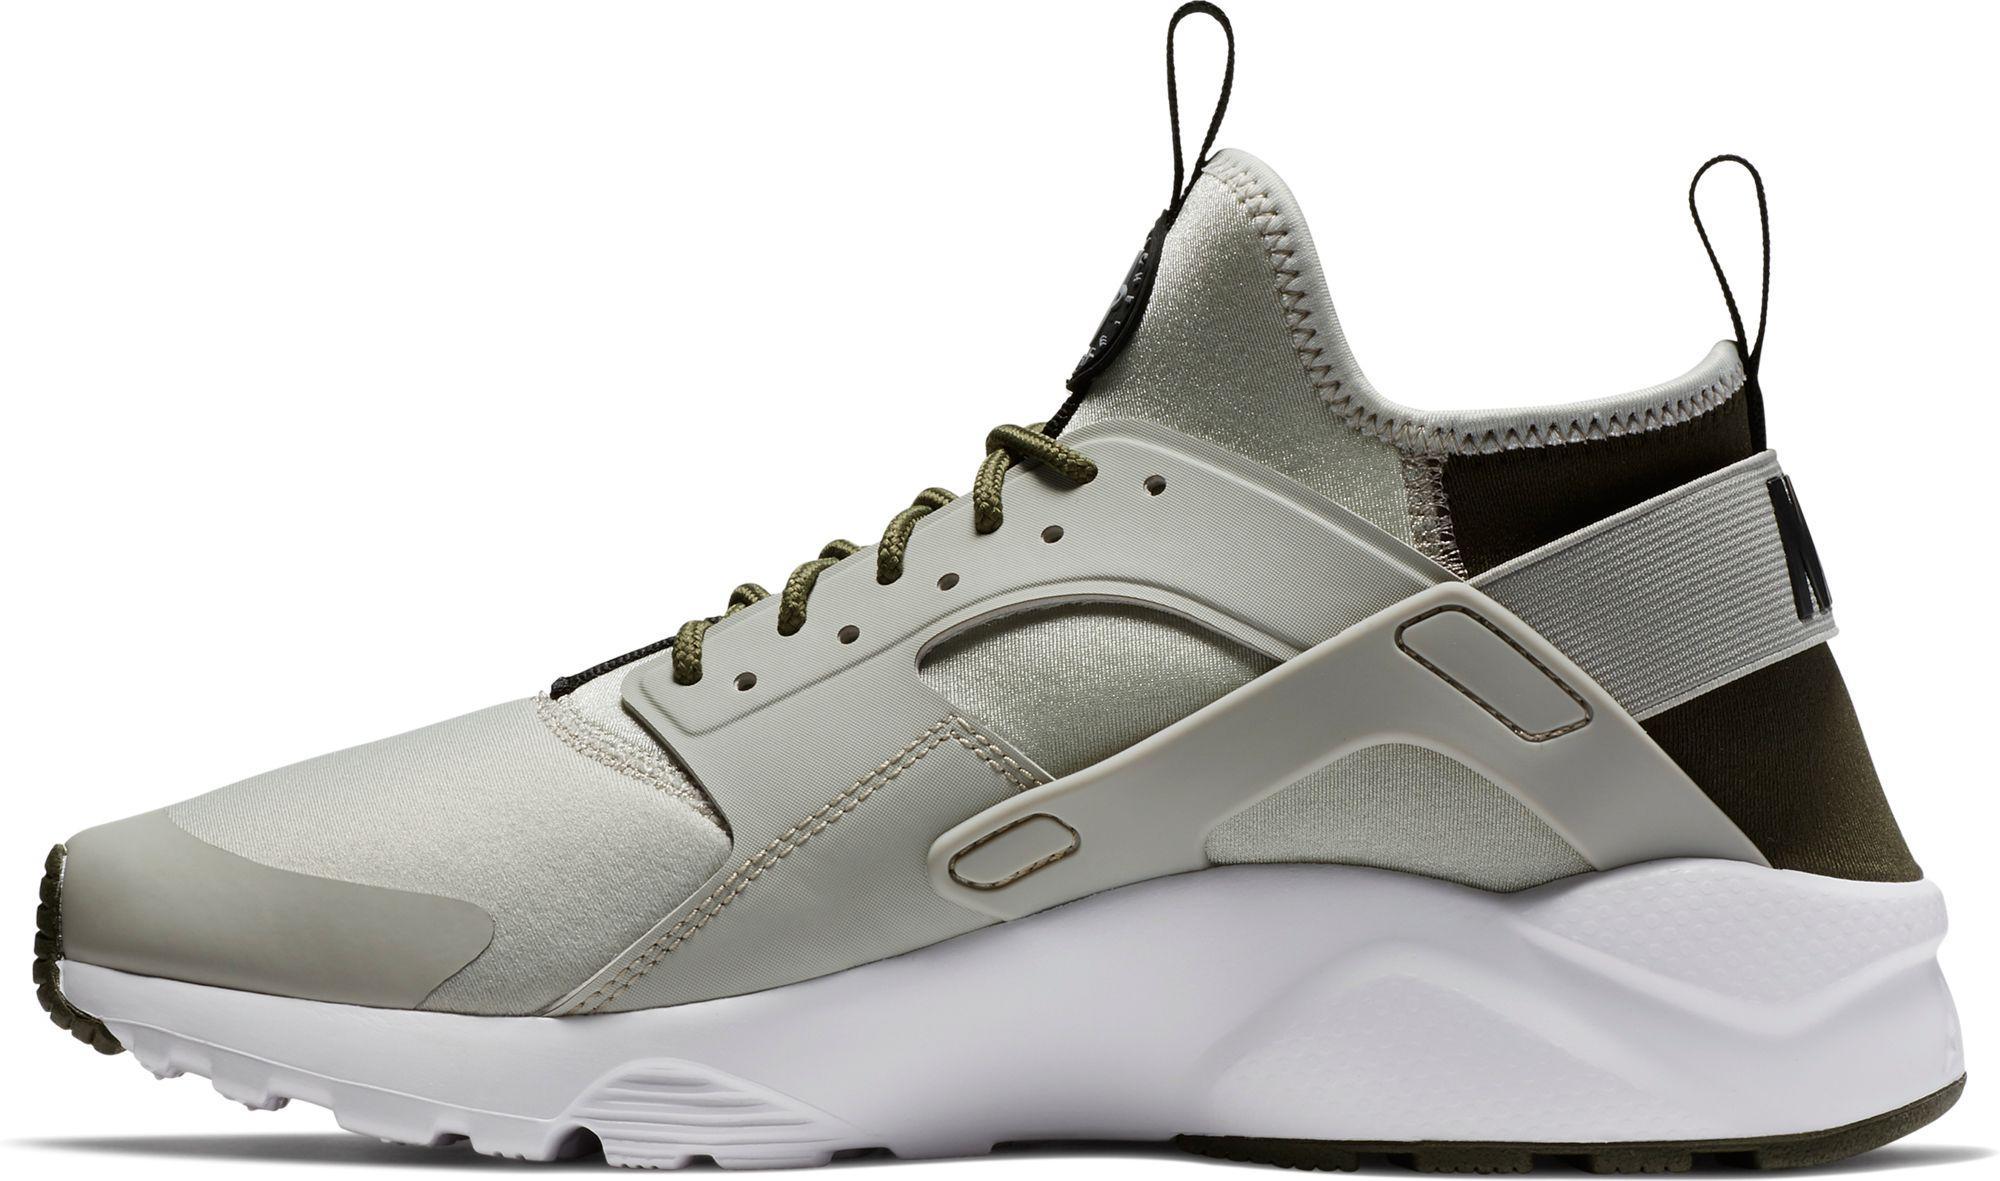 reputable site 2dcba 52697 Nike - Gray Air Huarache Run Ultra Shoes for Men - Lyst